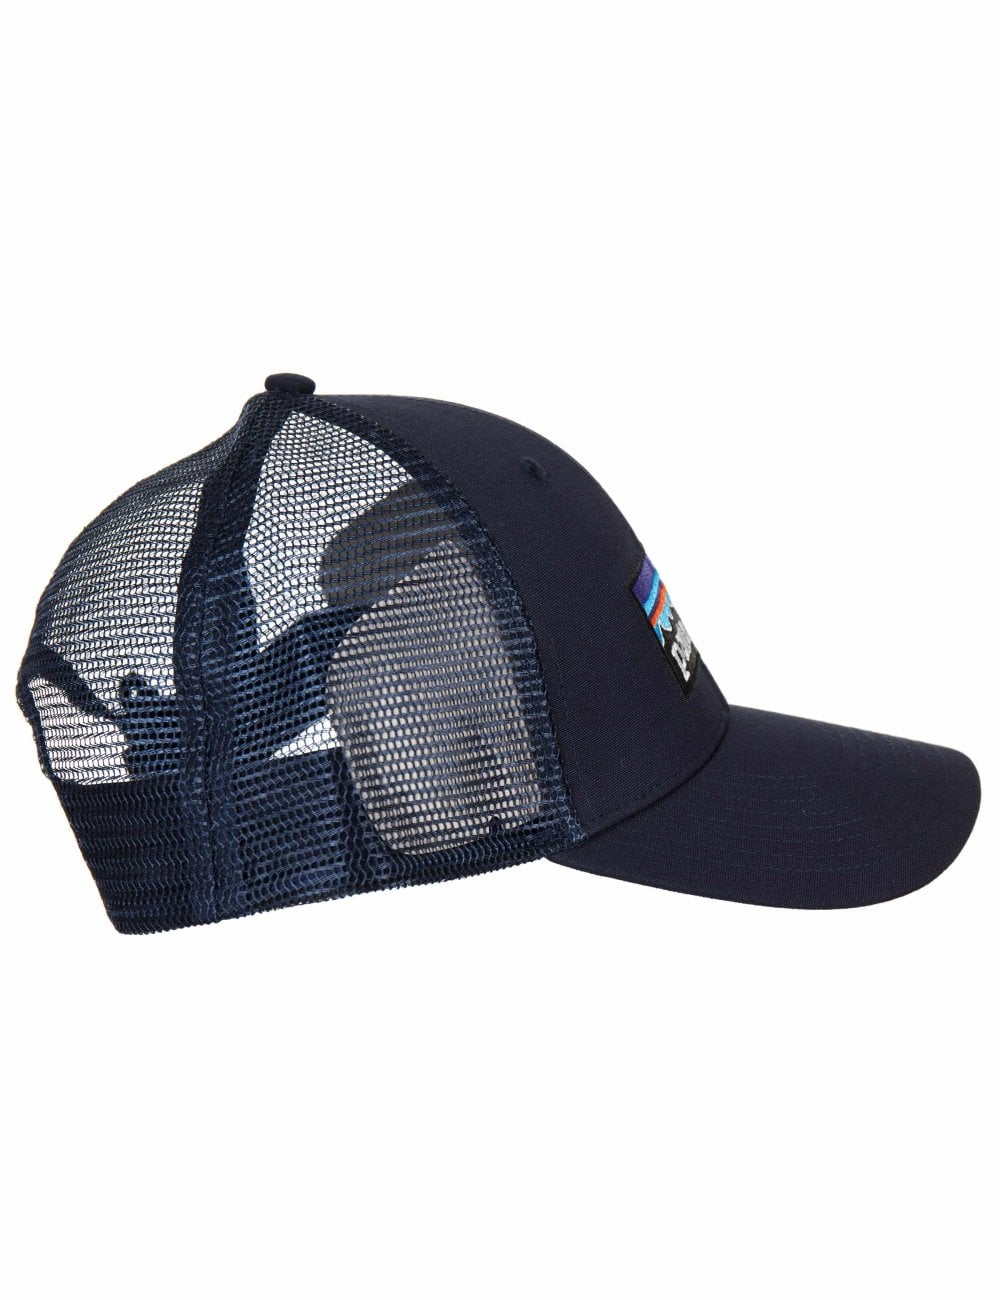 23b636ff9ac Patagonia P-6 Logo LoPro Trucker Hat - Navy Blue w Navy Blue ...